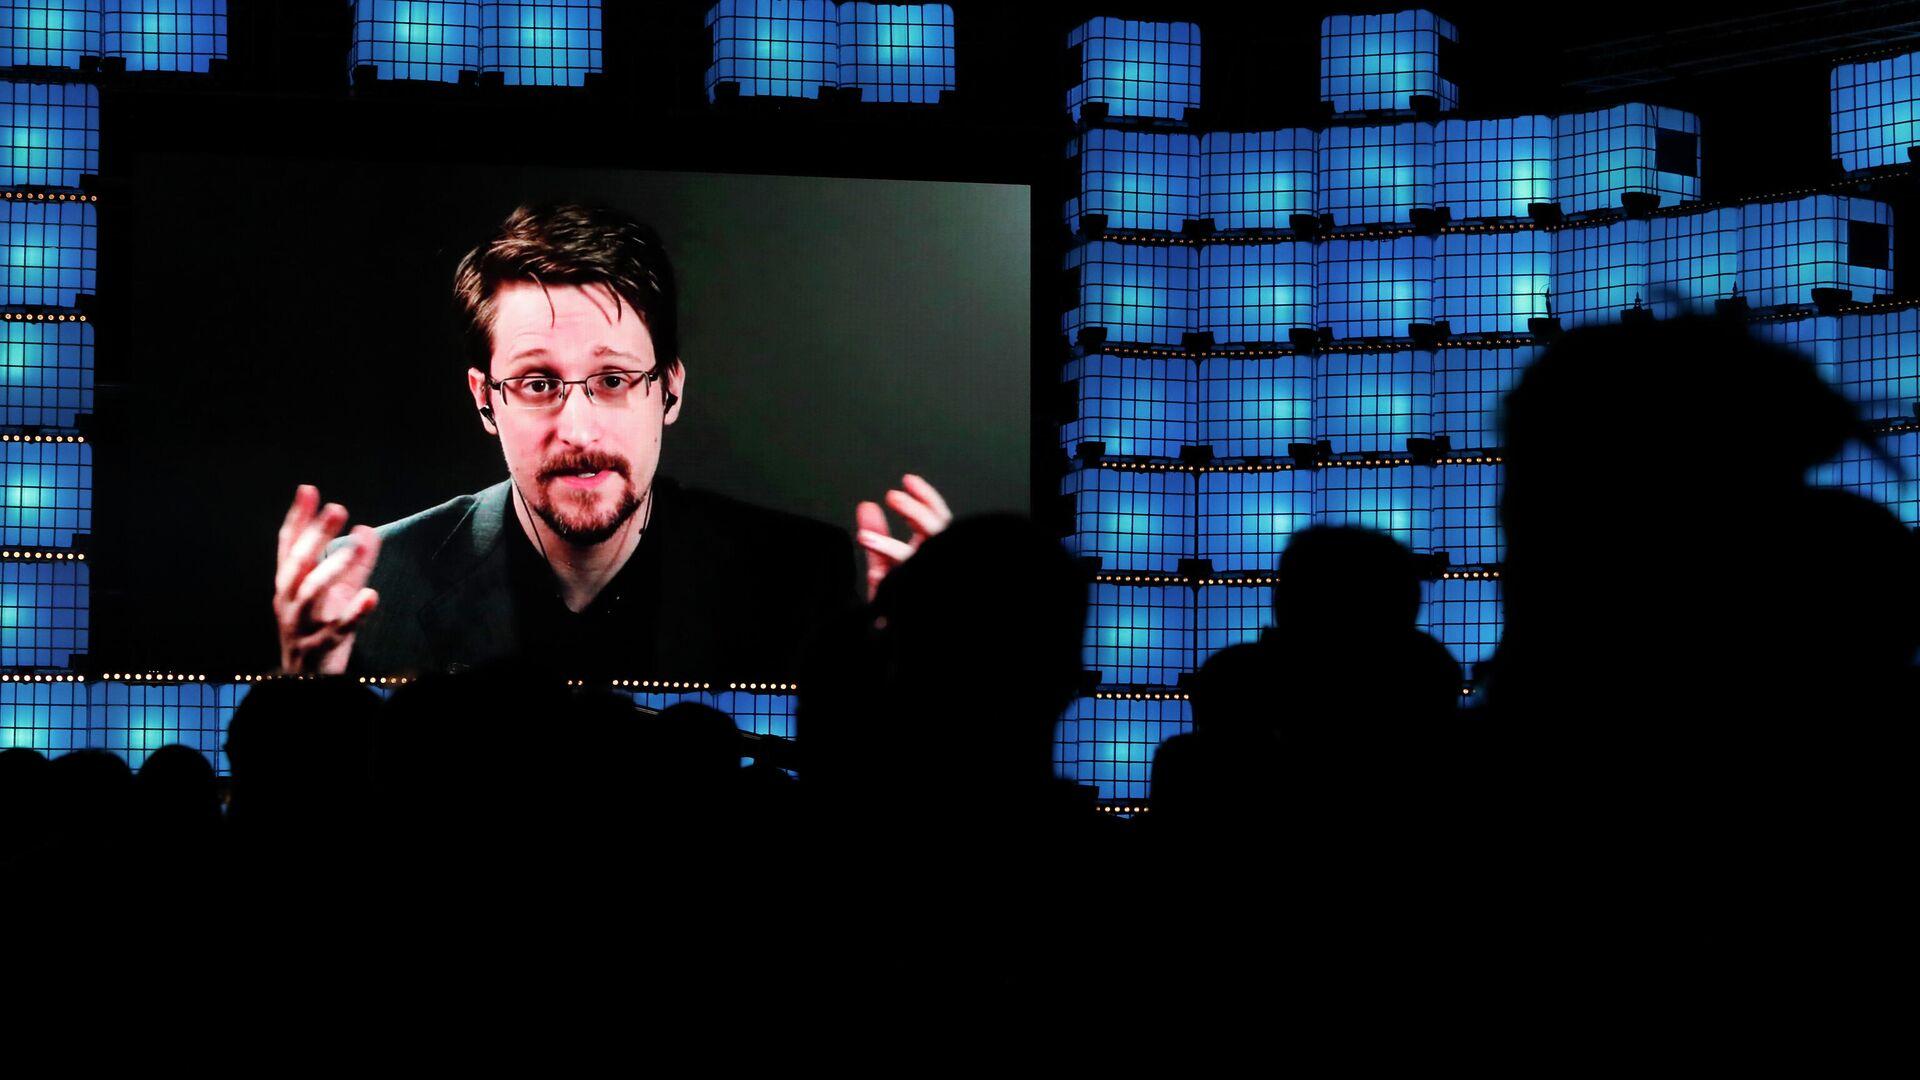 Эдвард Сноуден общается по видеосвязи с участникам технологической конференции Web Summit в Лиссабоне - РИА Новости, 1920, 05.10.2021